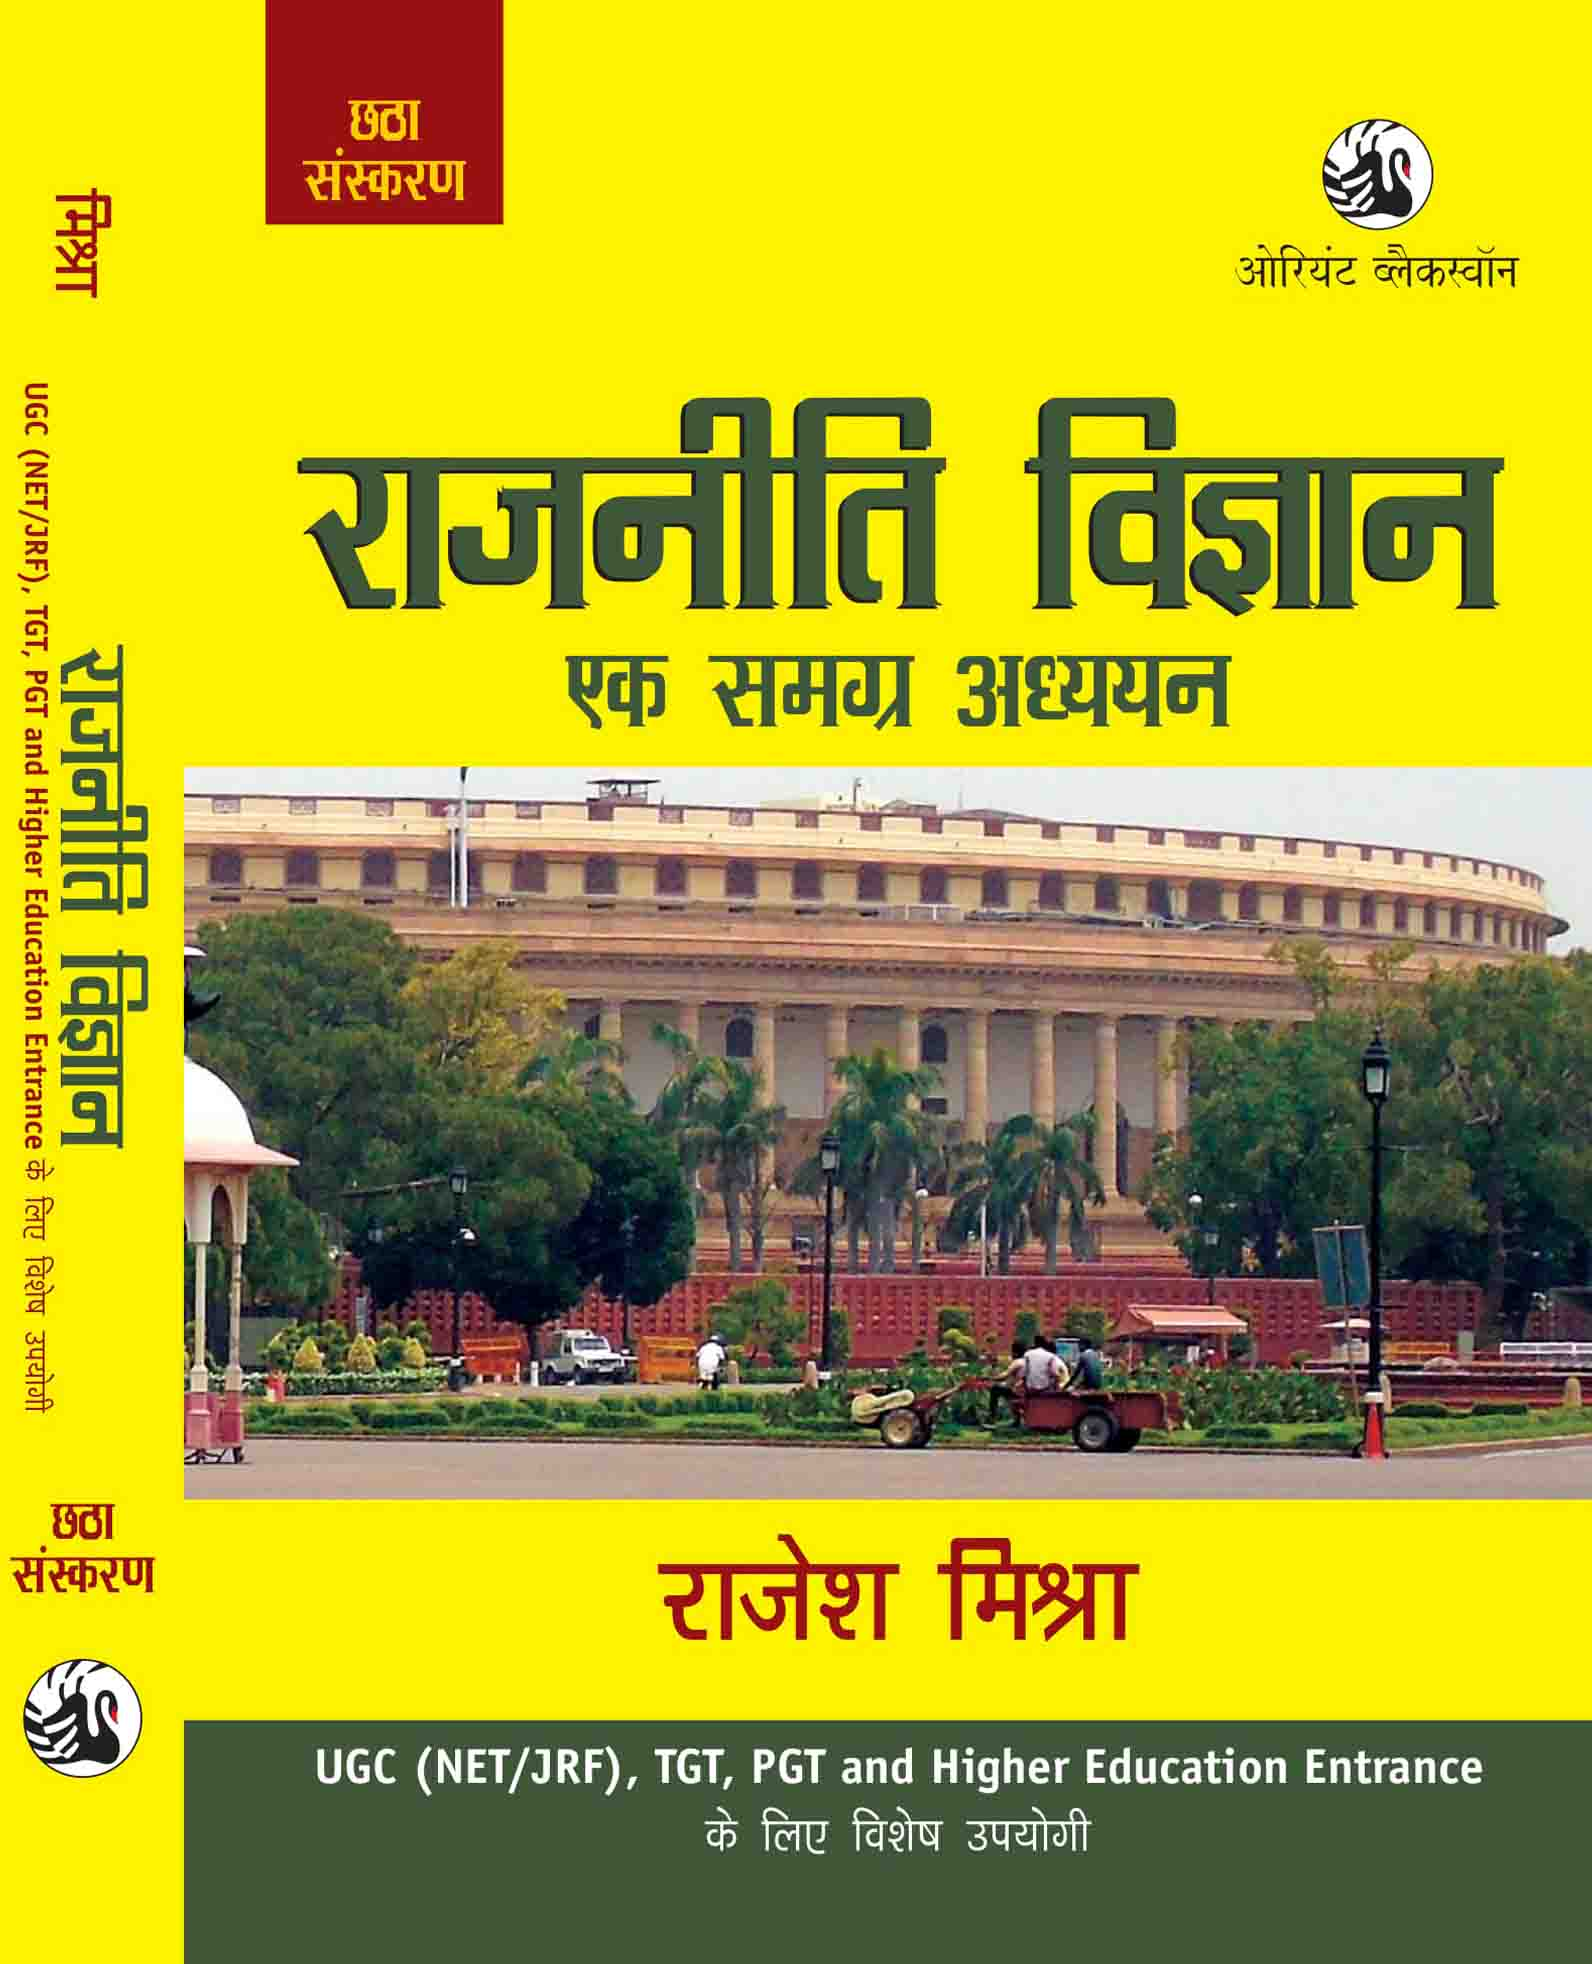 Hindi Rajneethi Vigyan Cover-1